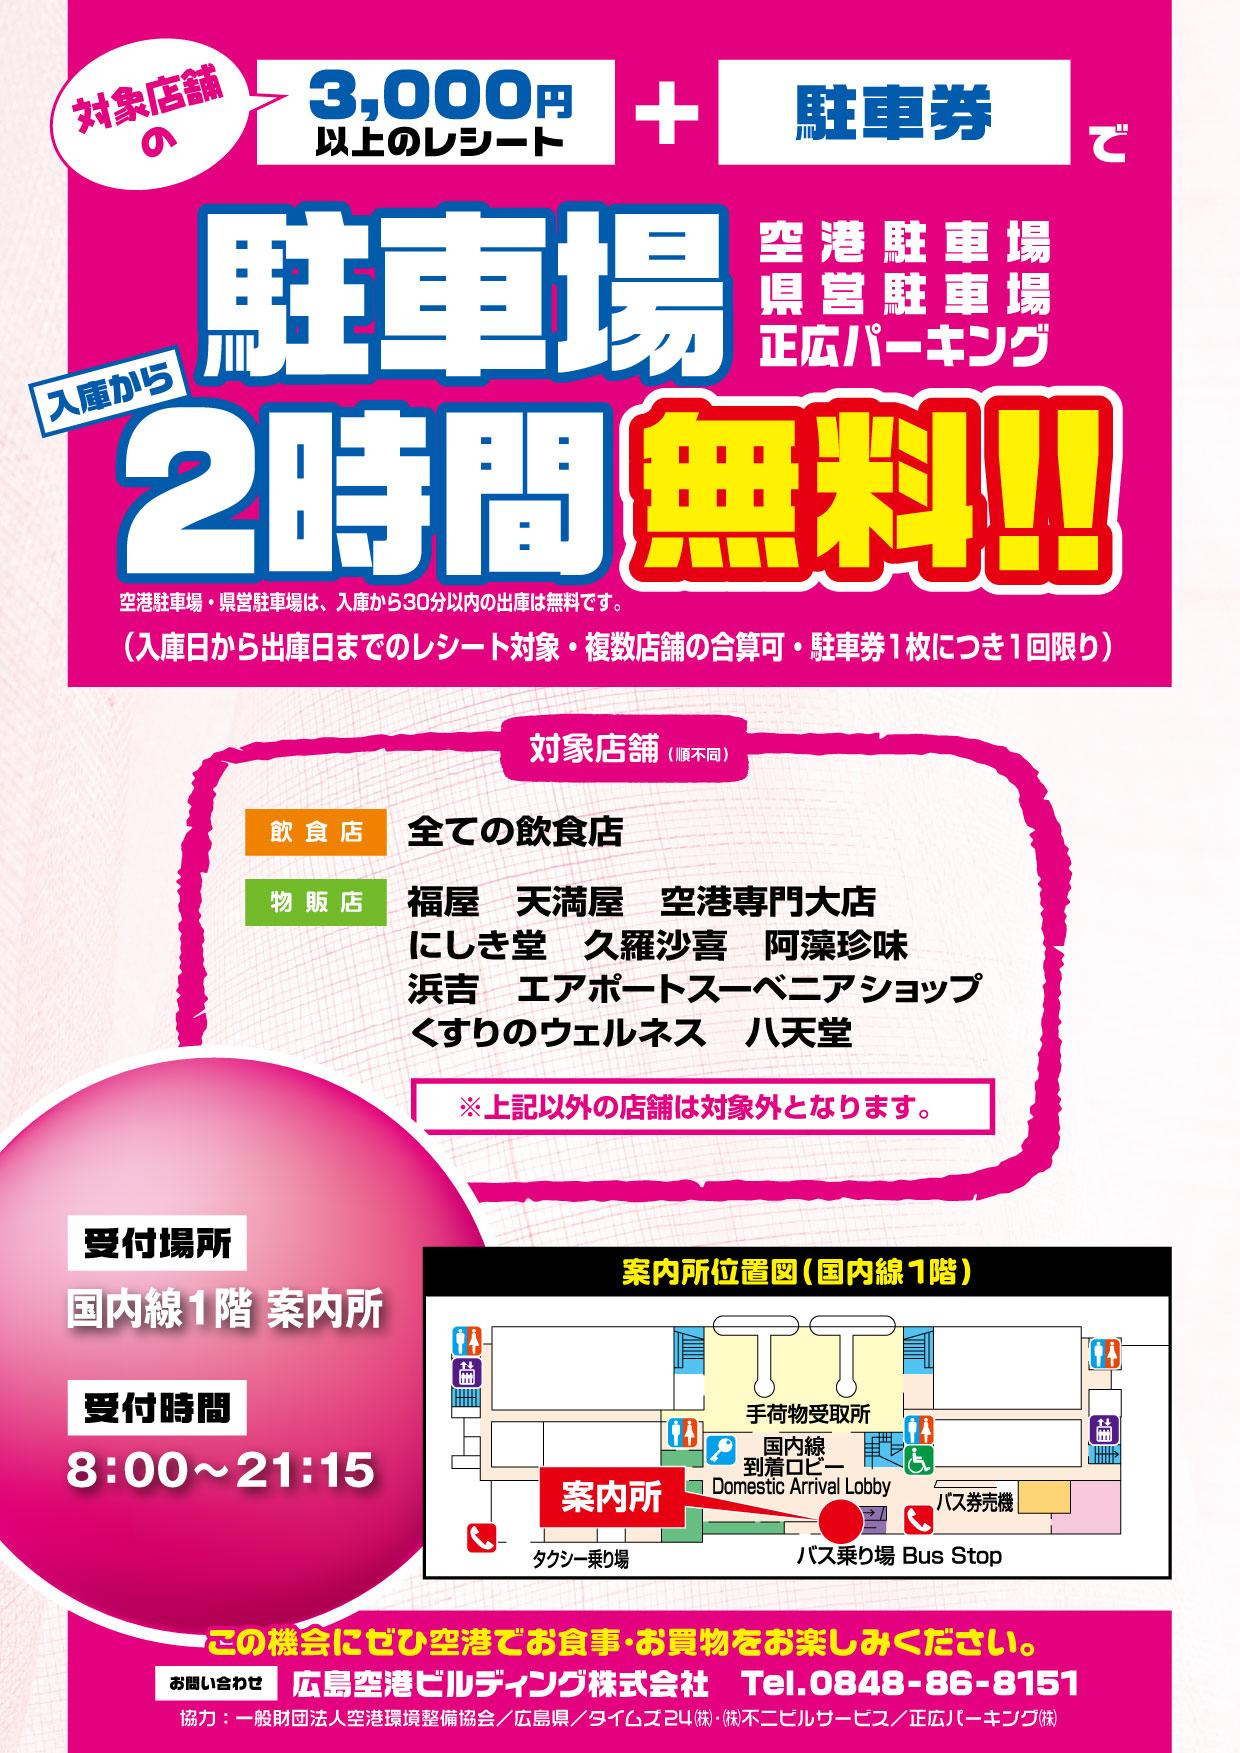 https://www.hij.airport.jp/assets/img/cms/201912/20160608_chushajowaribiki02.jpg